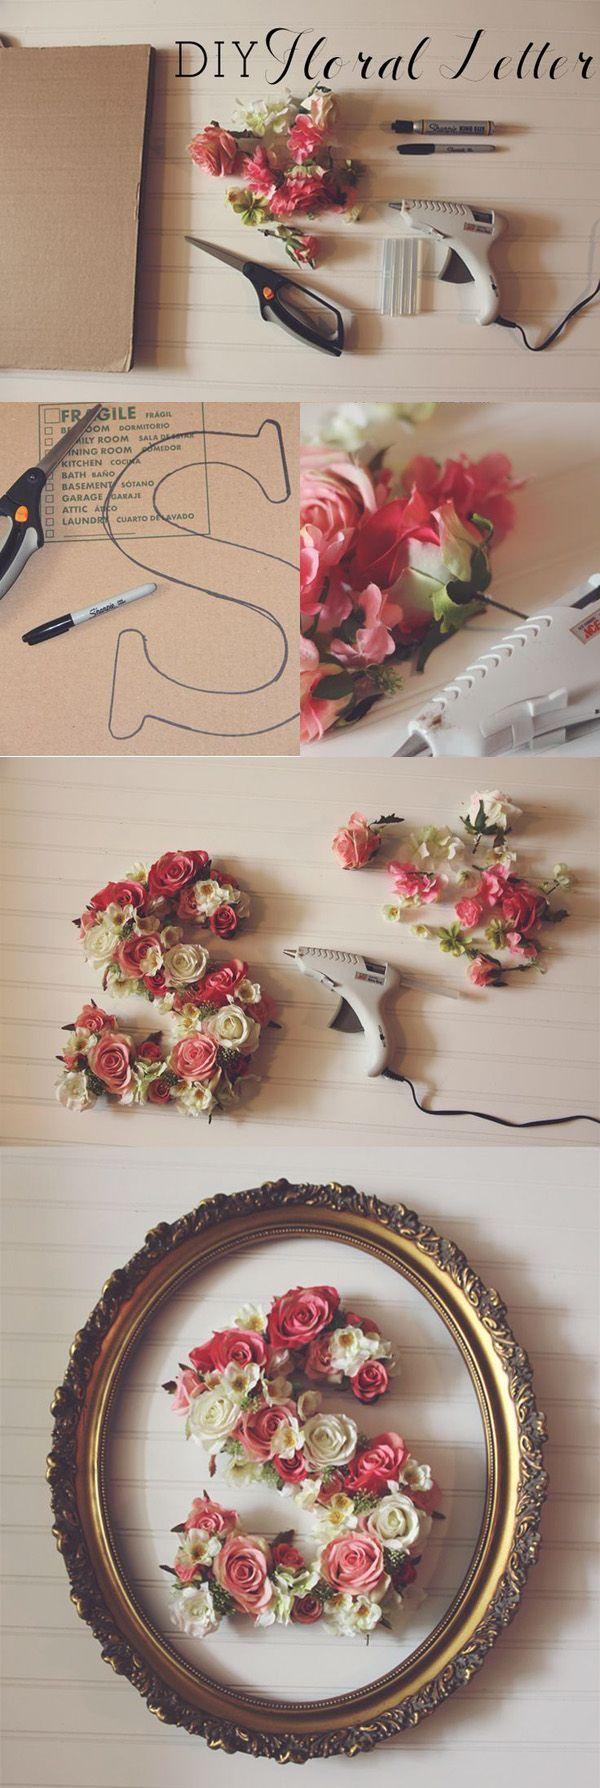 DIY Floral Letter – 35 kreative DIY Buchstaben im Leben